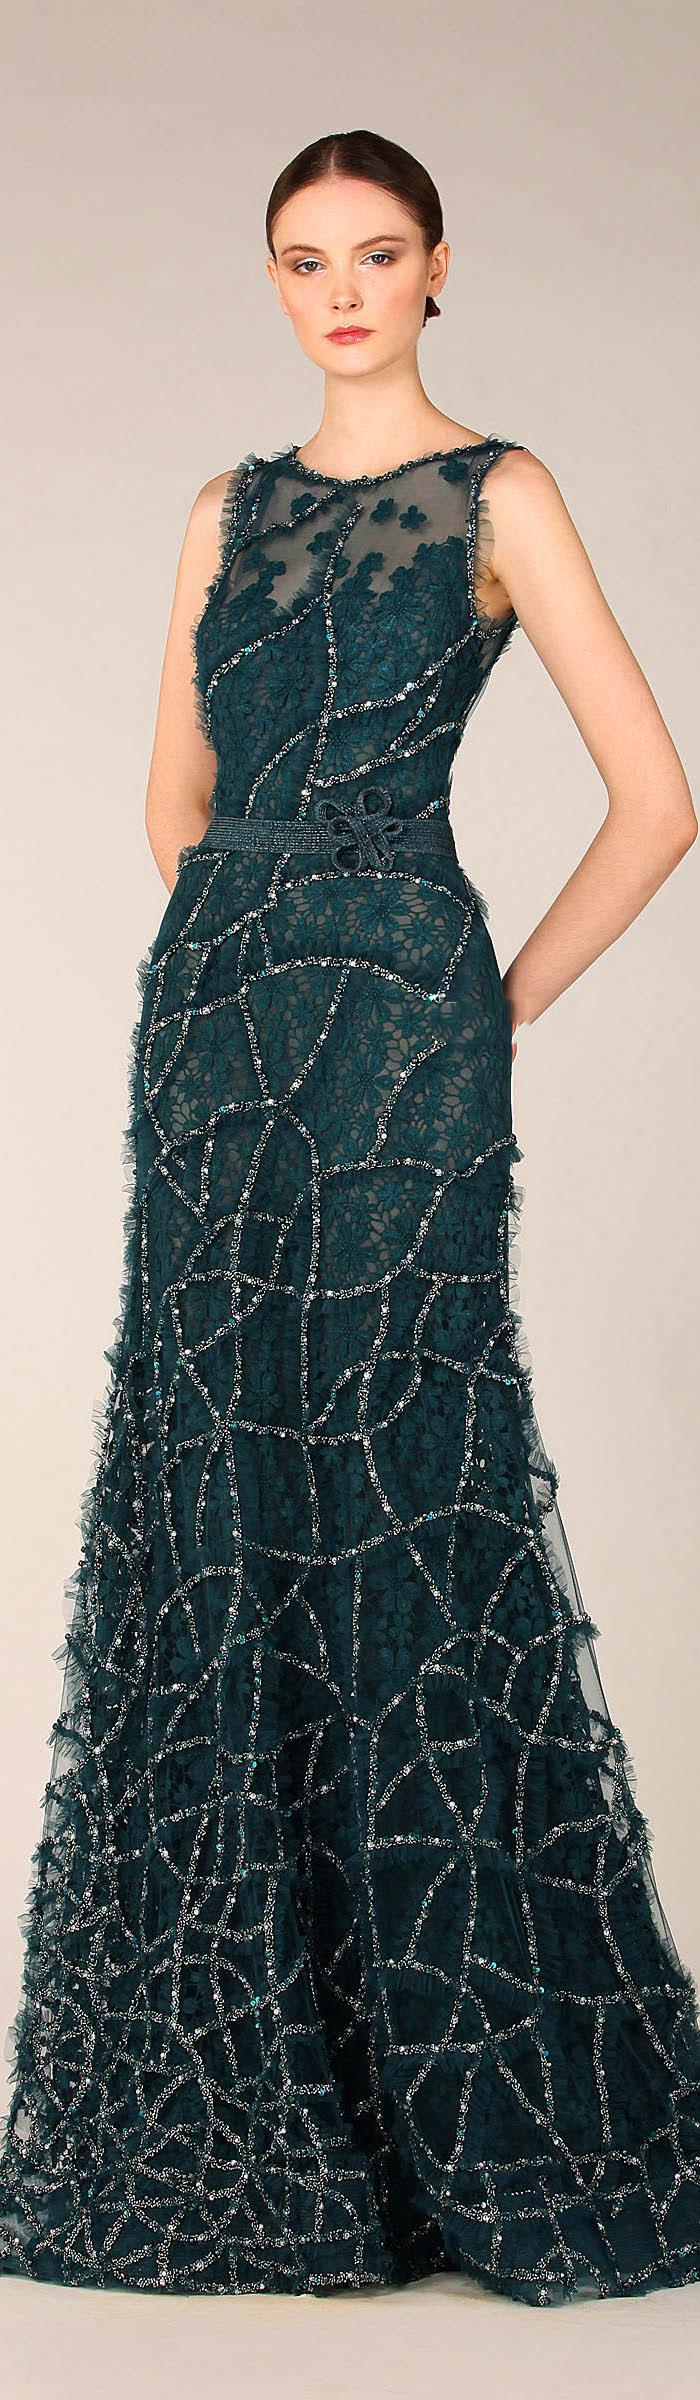 tony ward fallwinter 20132014  fashion dresses